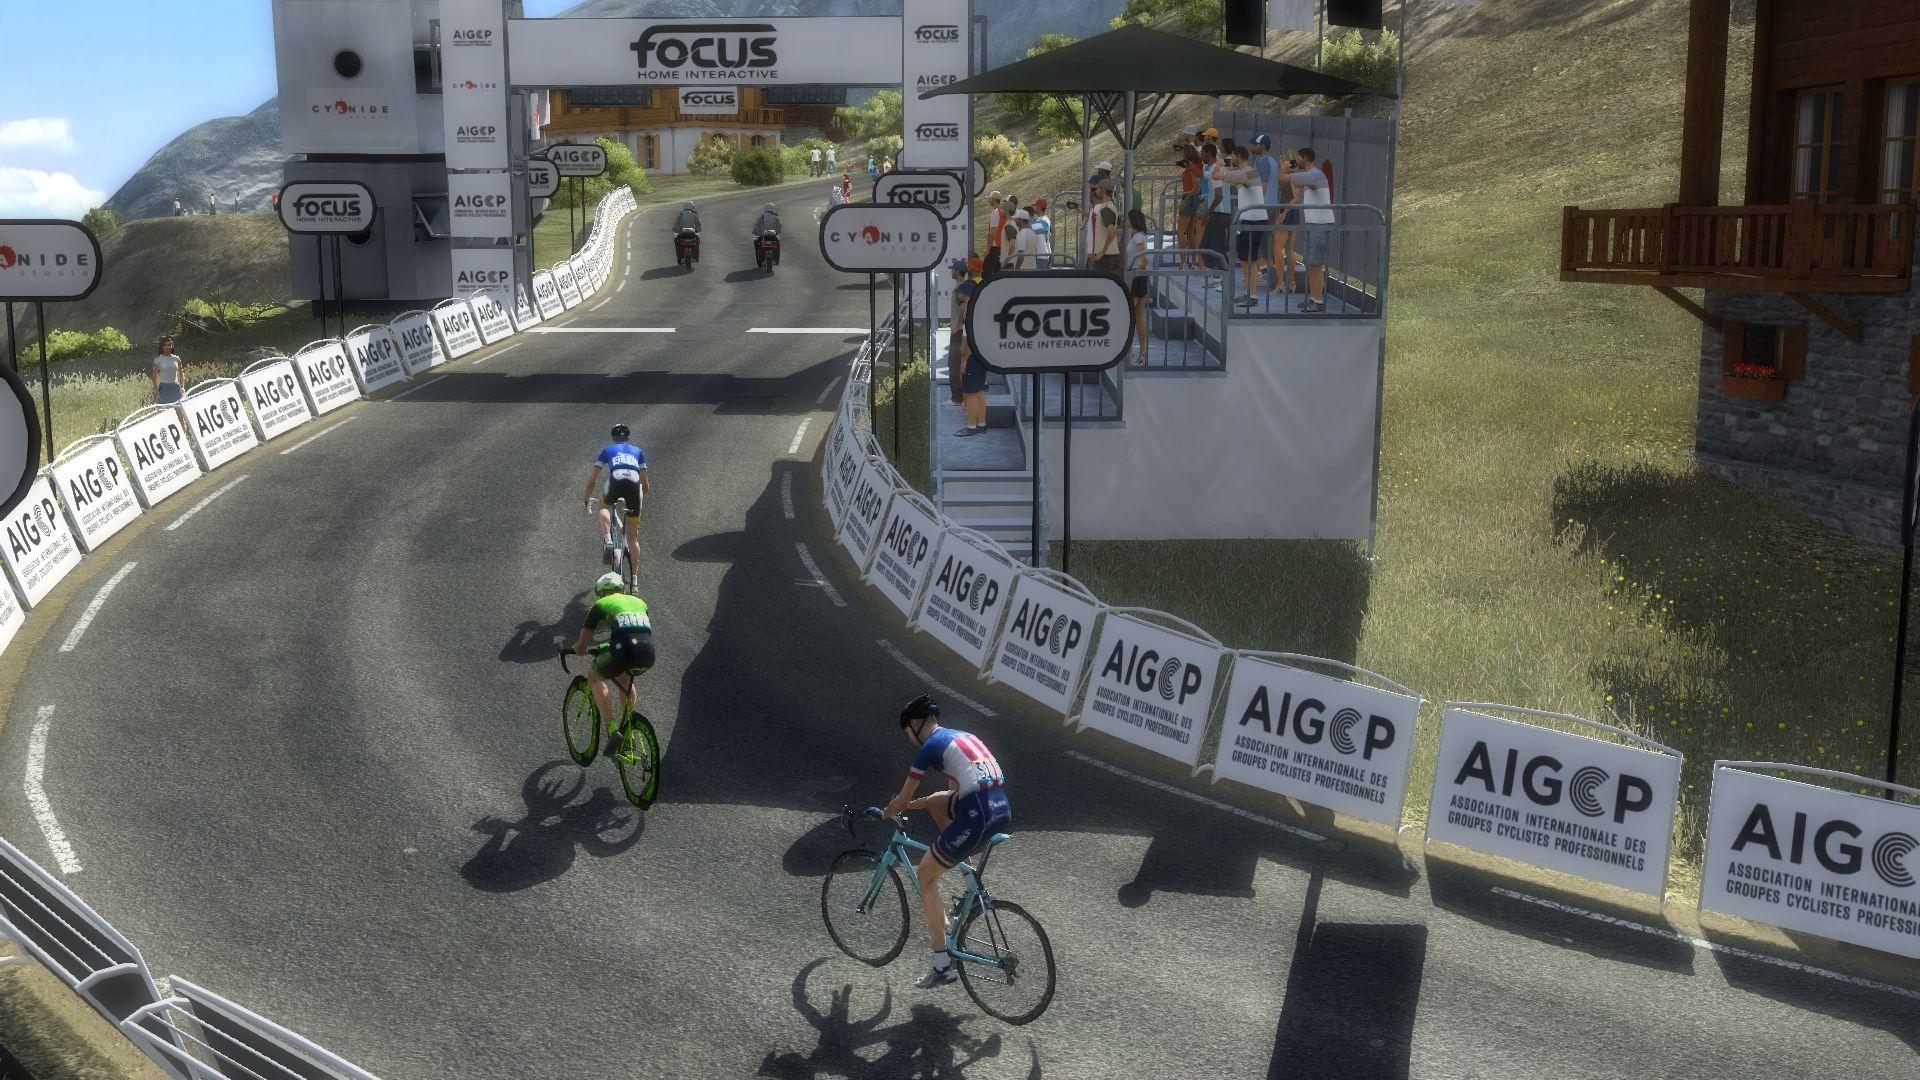 pcmdaily.com/images/mg/2019/Races/PT/Tirreno/mg19_ta_s05_23.jpg